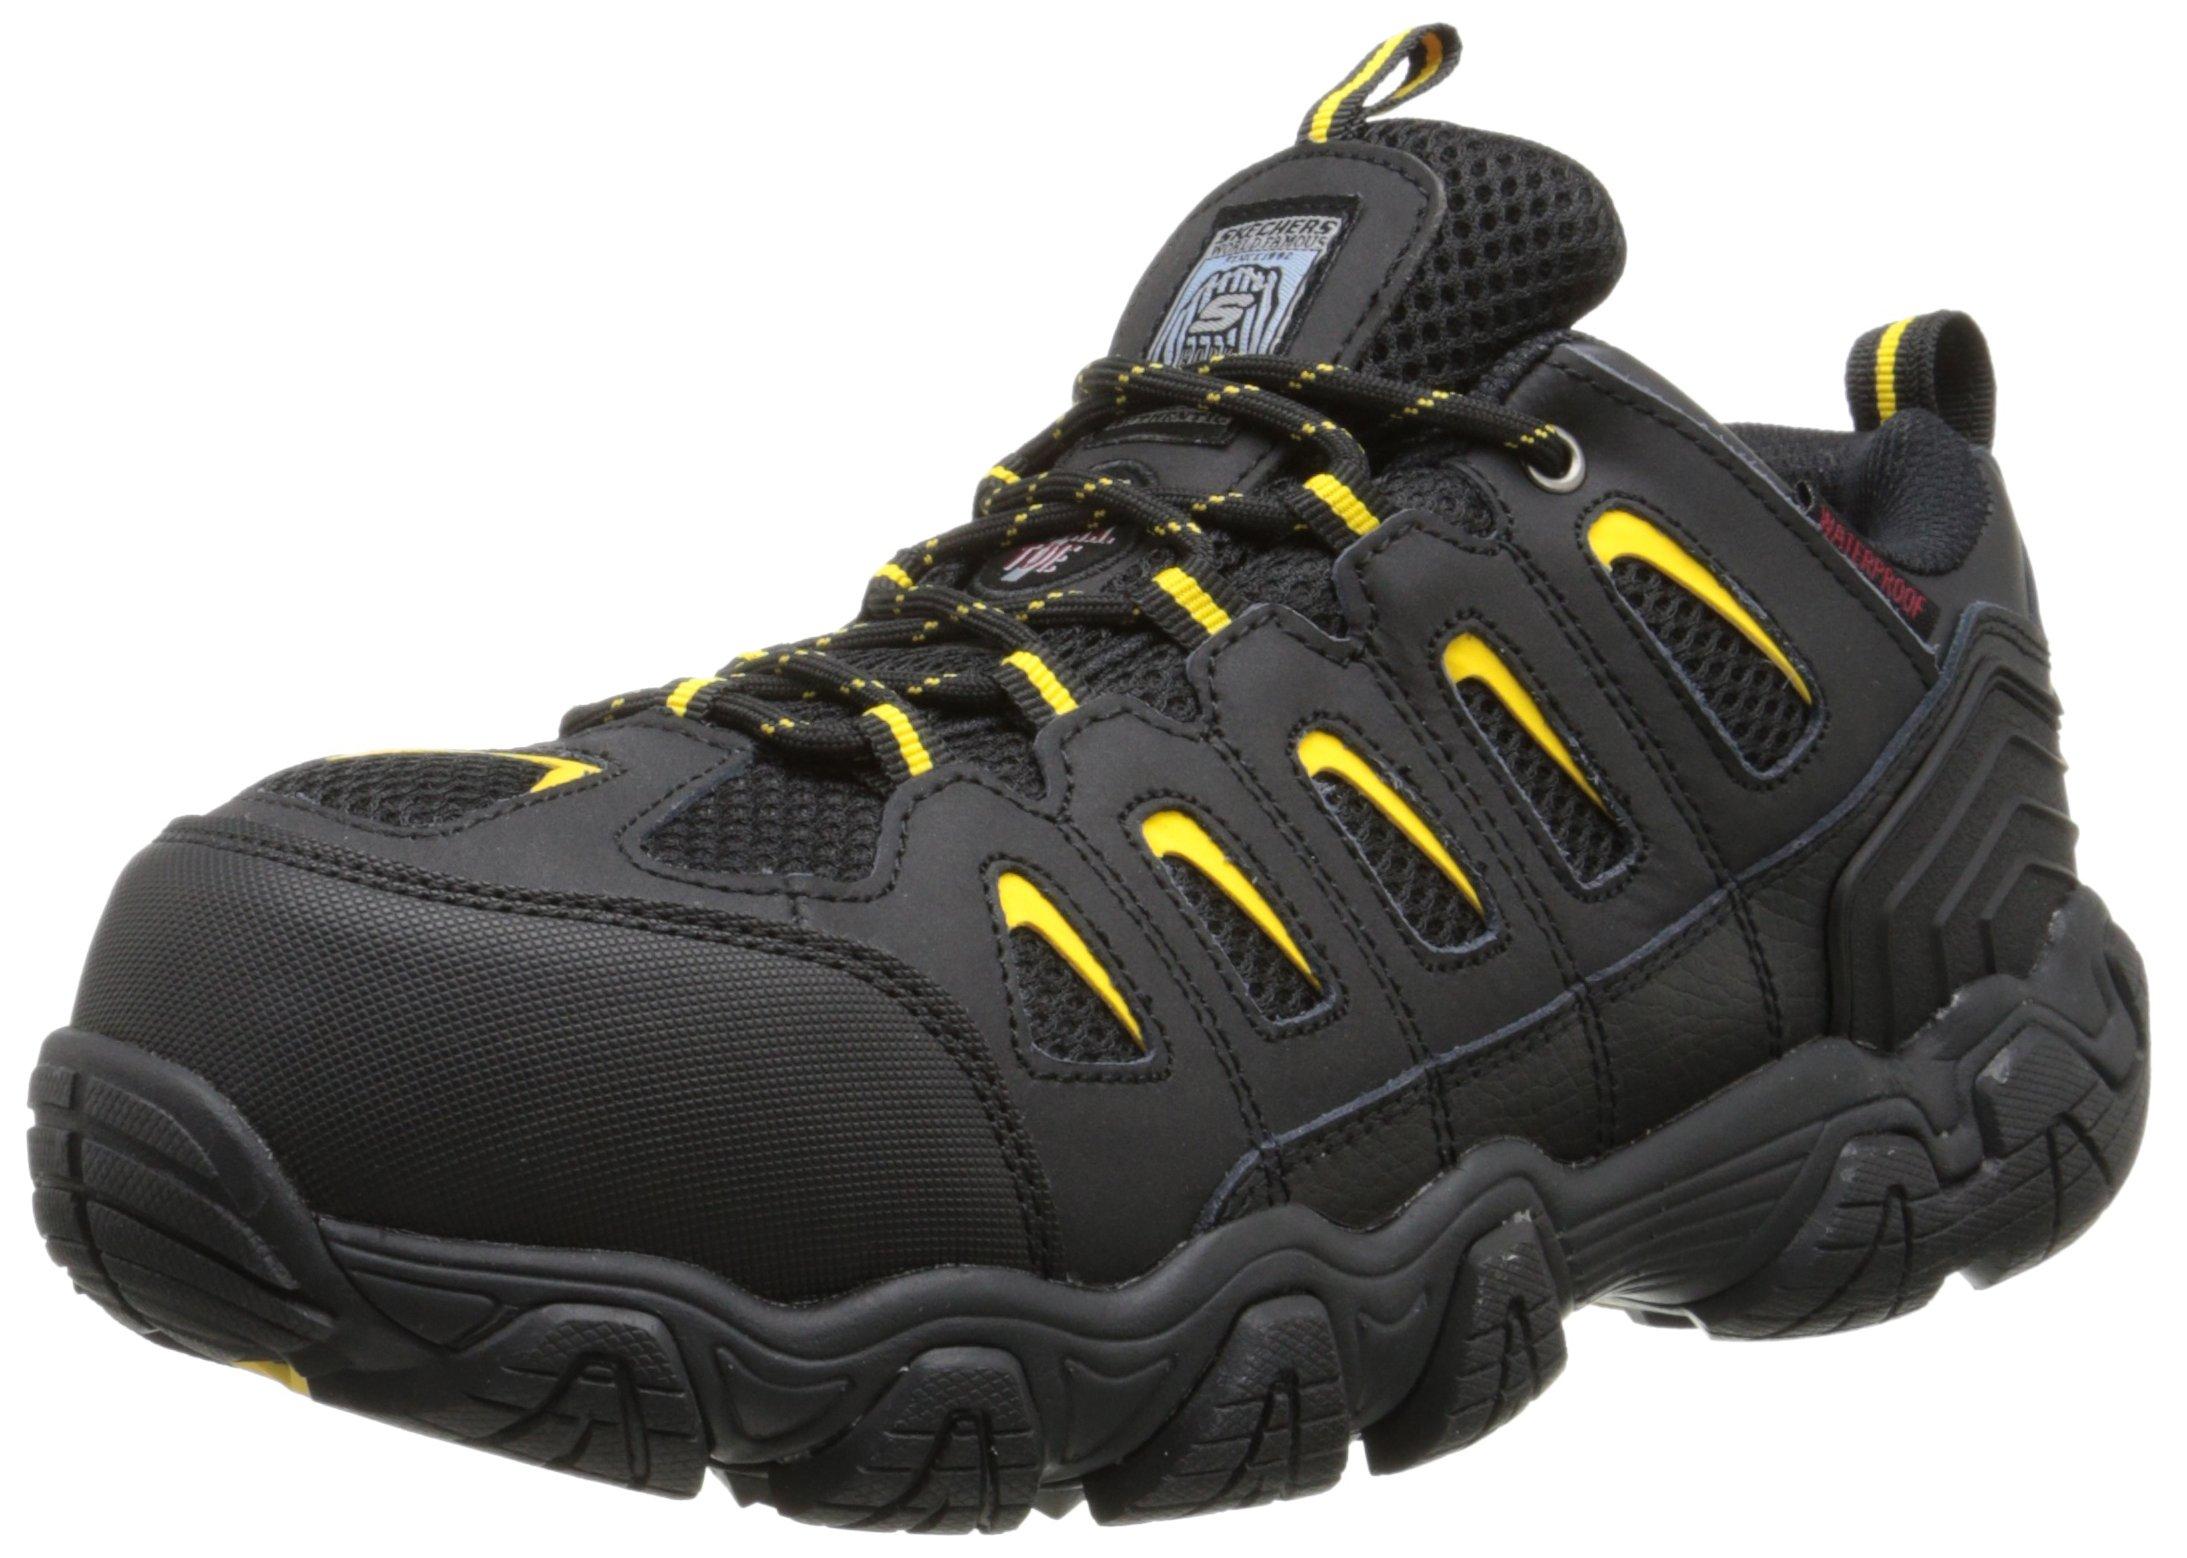 Skechers for Work Men's Blais Hiking Shoe, Black, 10 M US by Skechers